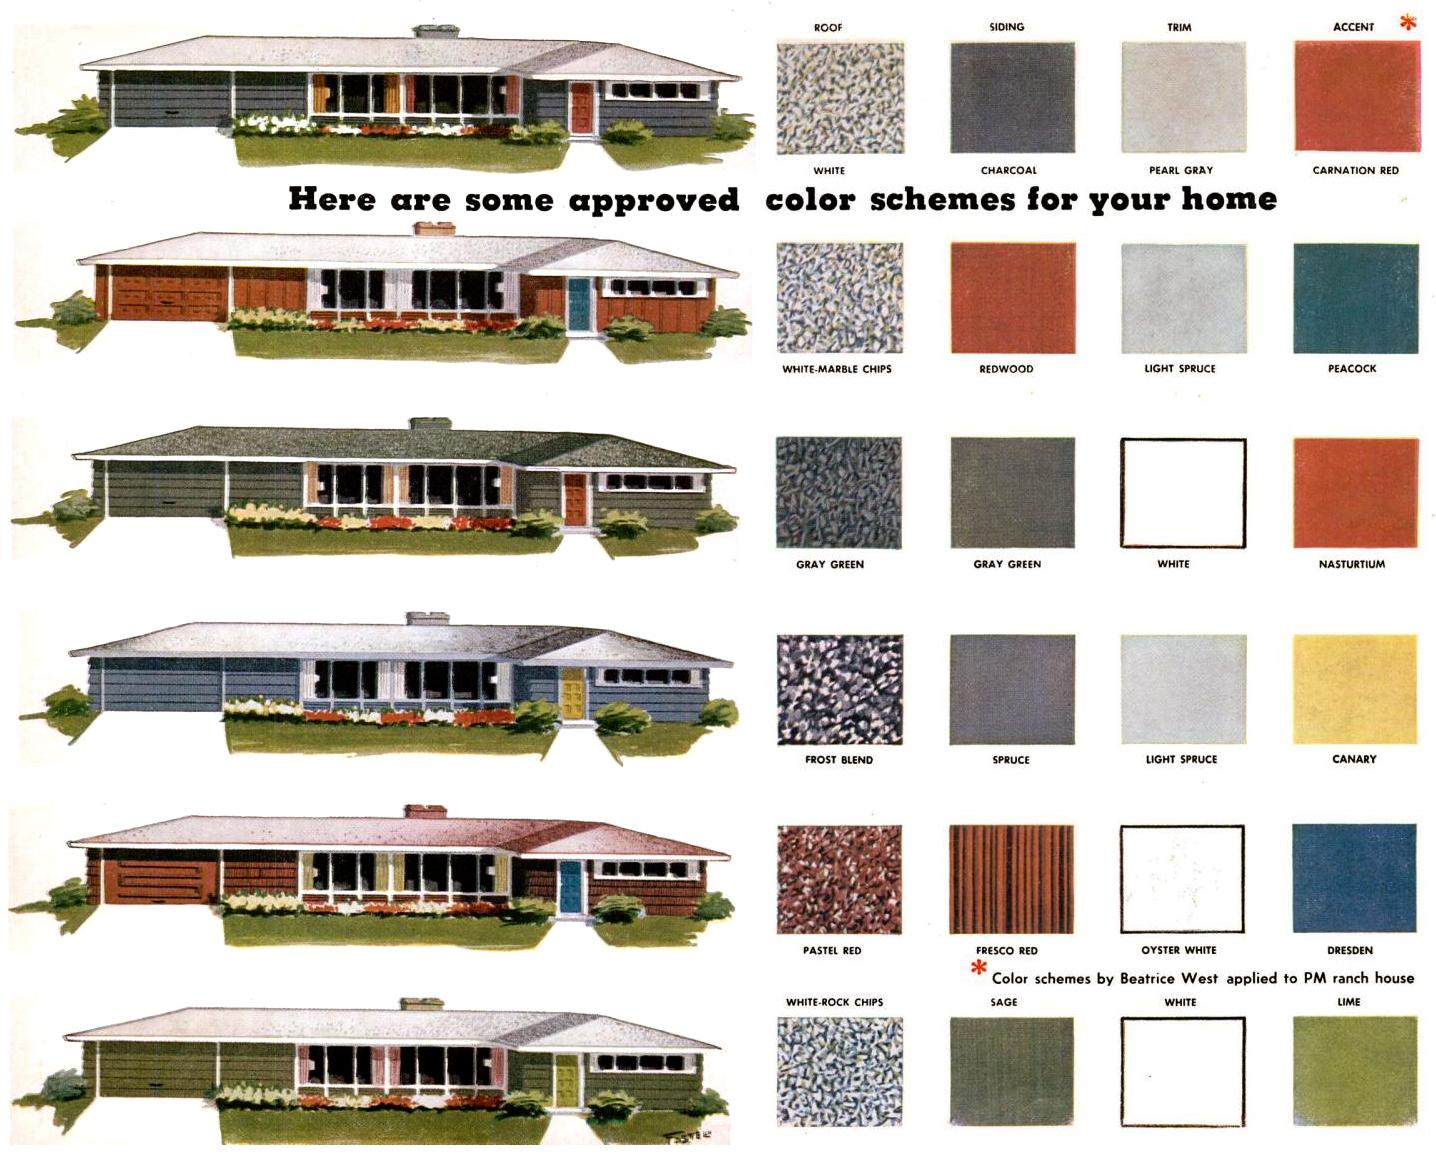 Groovy 17 Best Images About Exterior Paint Schemes On Pinterest Largest Home Design Picture Inspirations Pitcheantrous